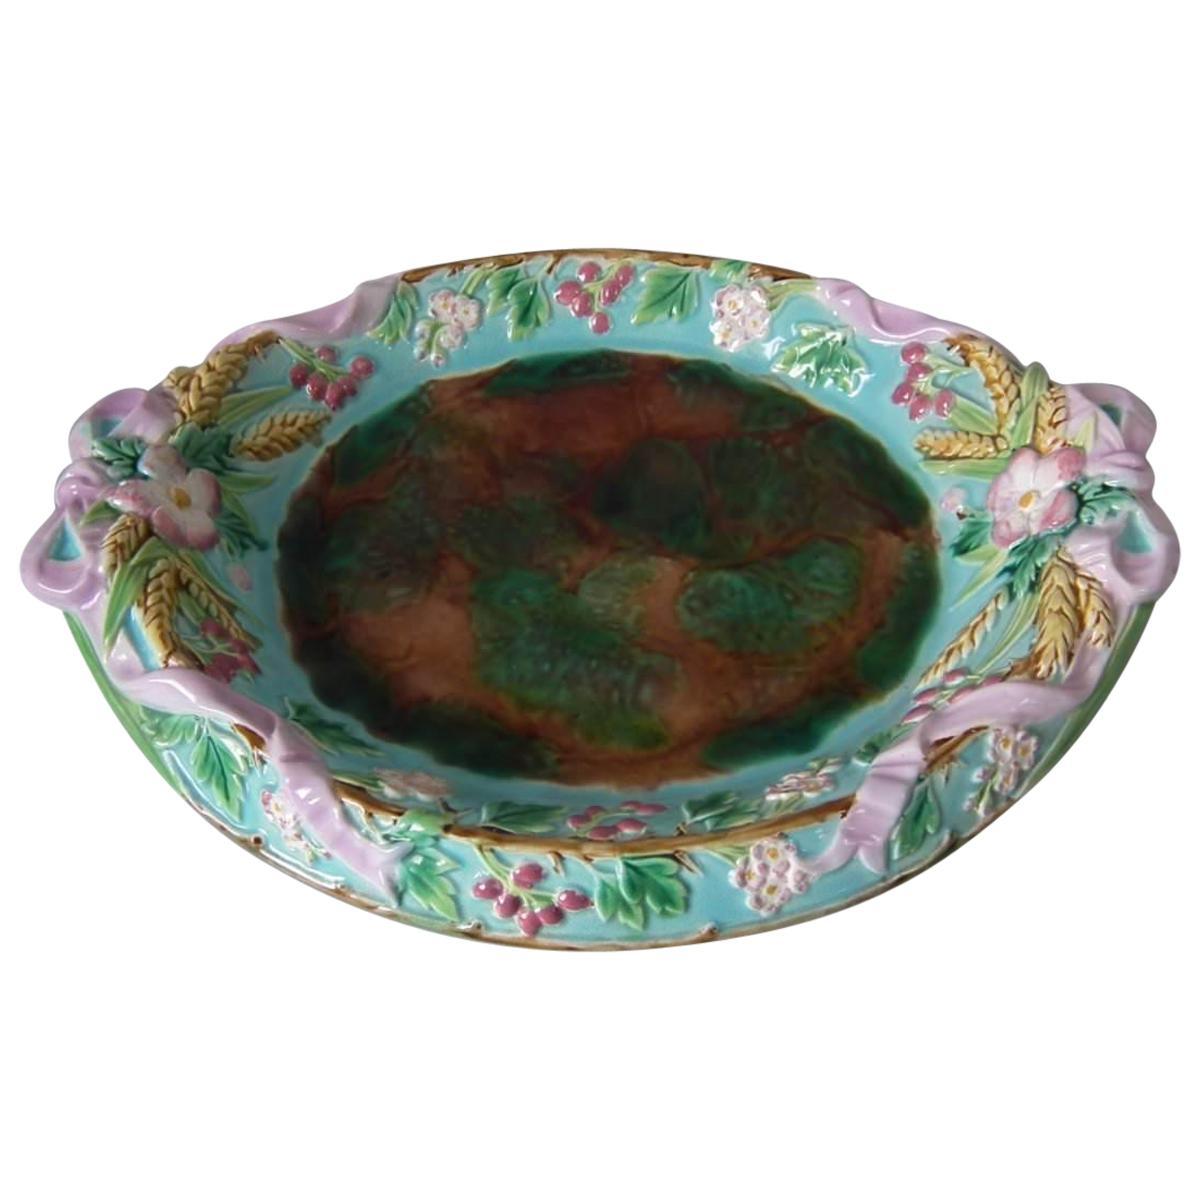 George Jones Majolica Bread Platter